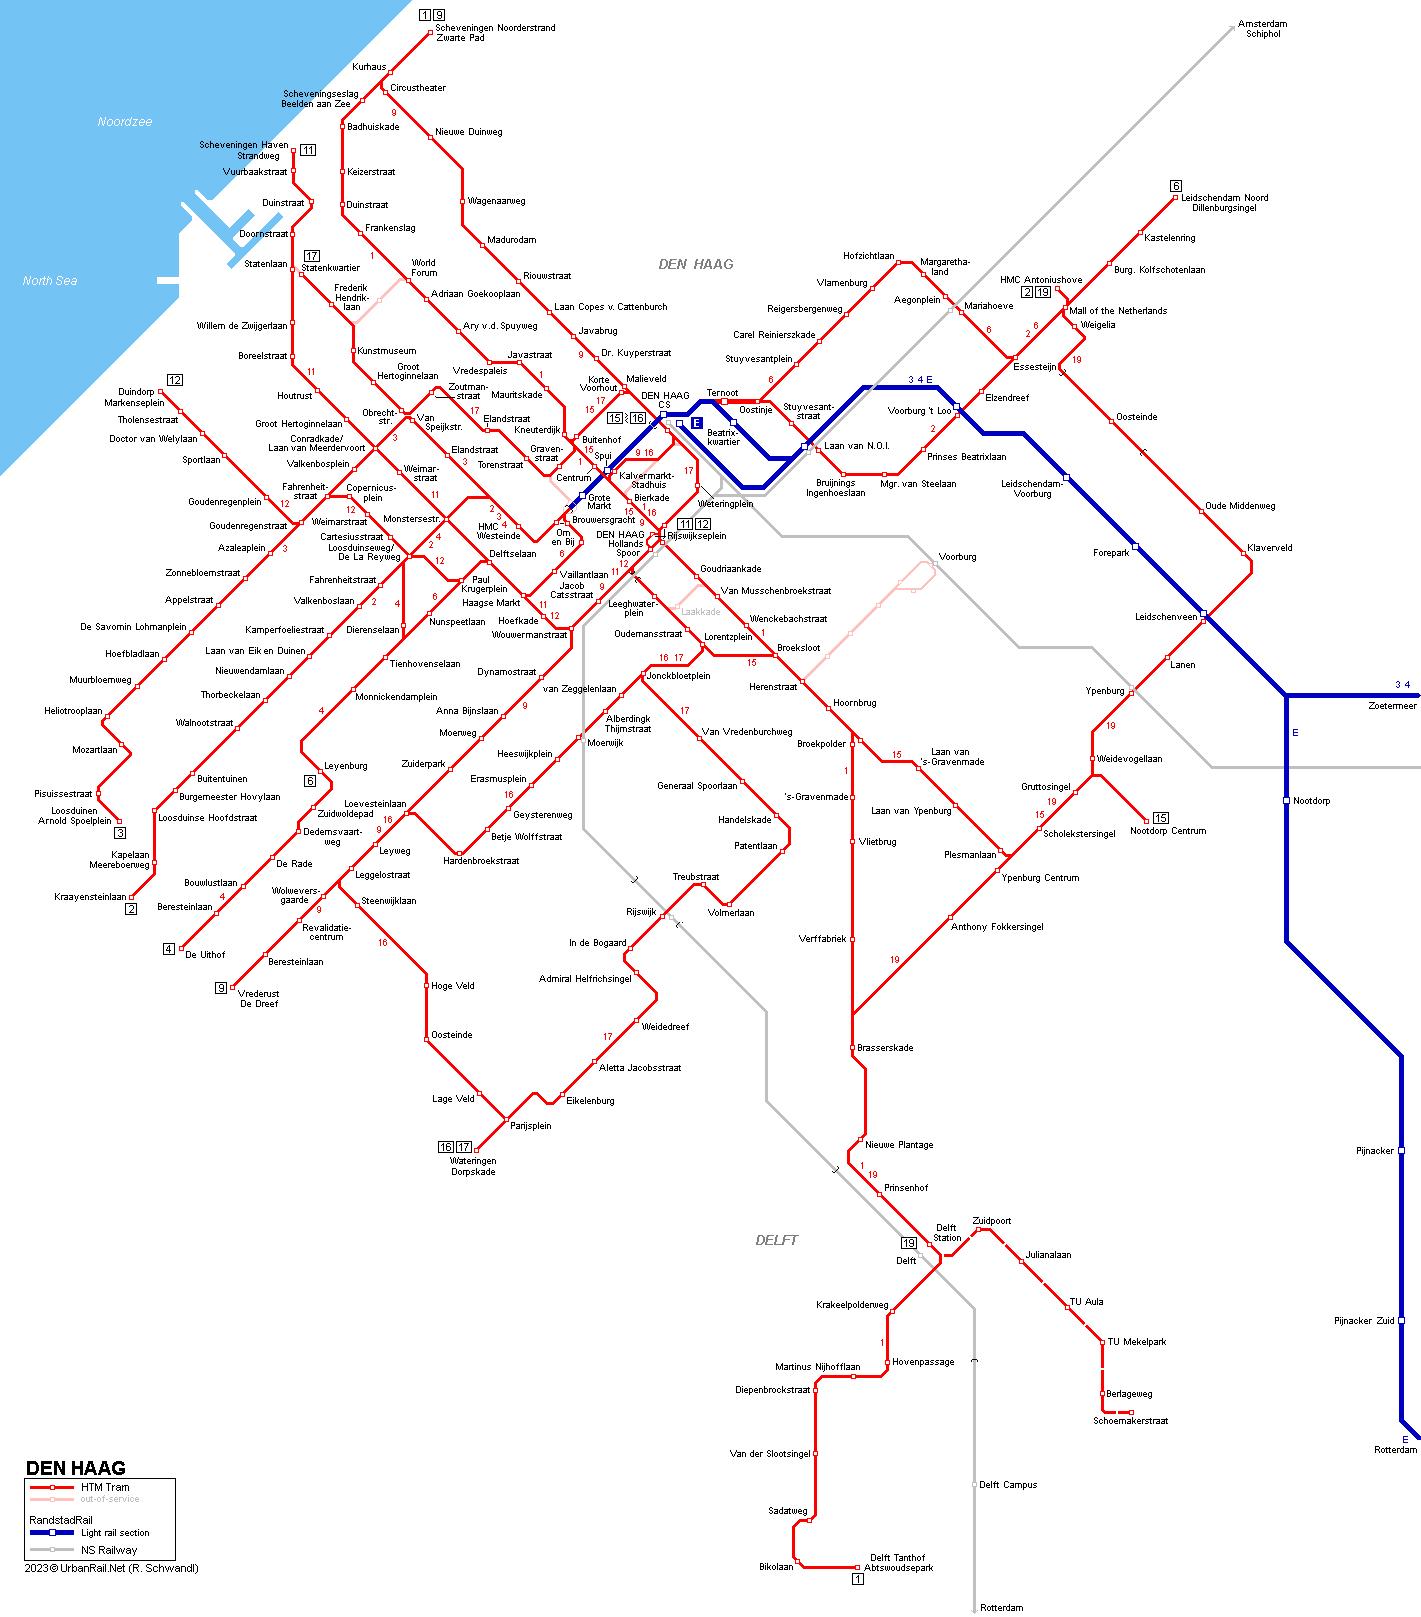 Worksheet. UrbanRailNet  Europe  Netherlands  Den Haag Tram  RandstadRail